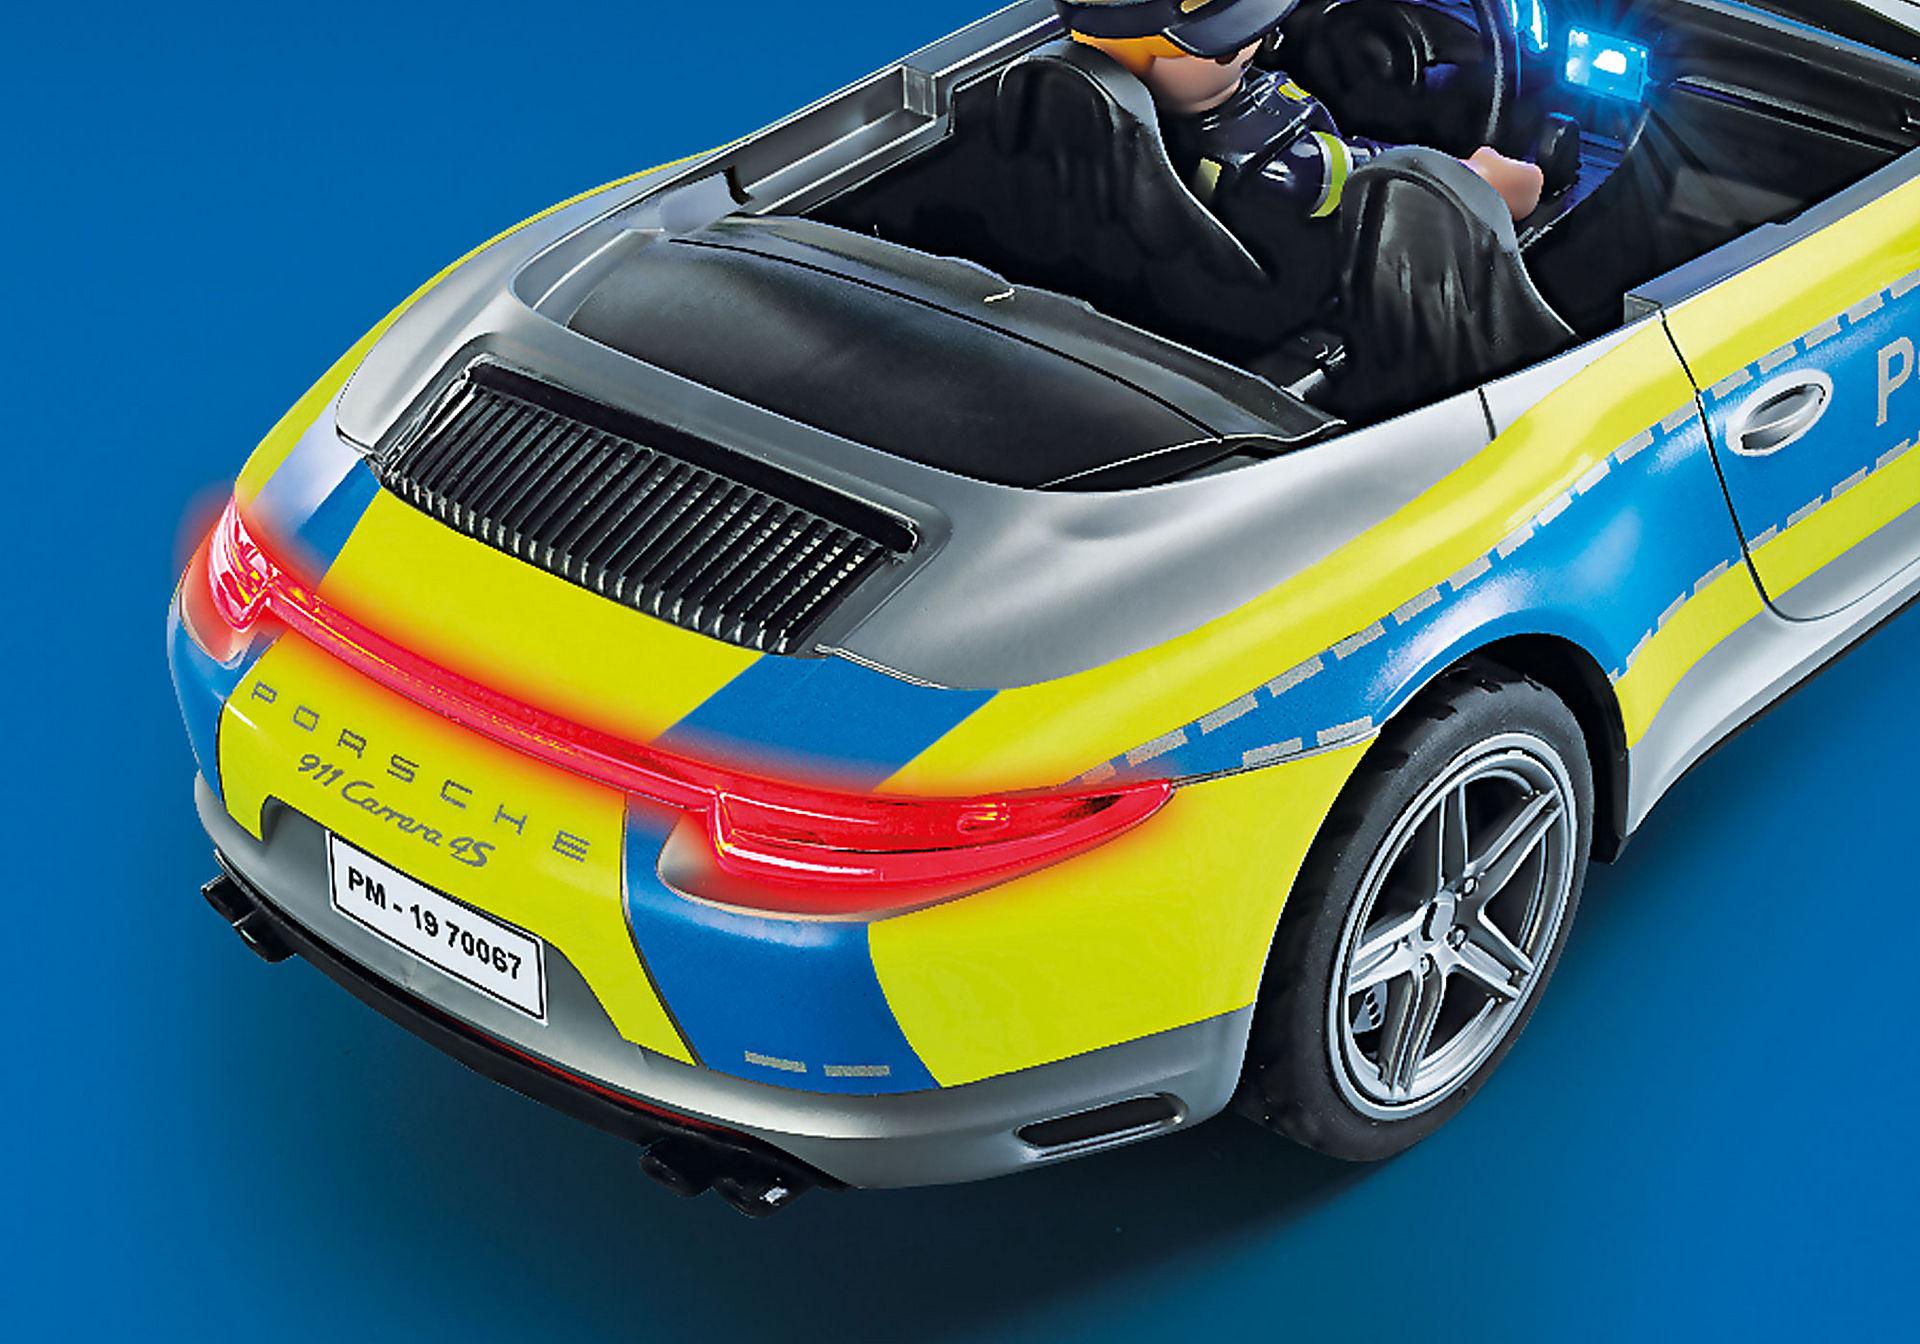 70067 Porsche 911 Carrera 4S Polis – Grå zoom image6